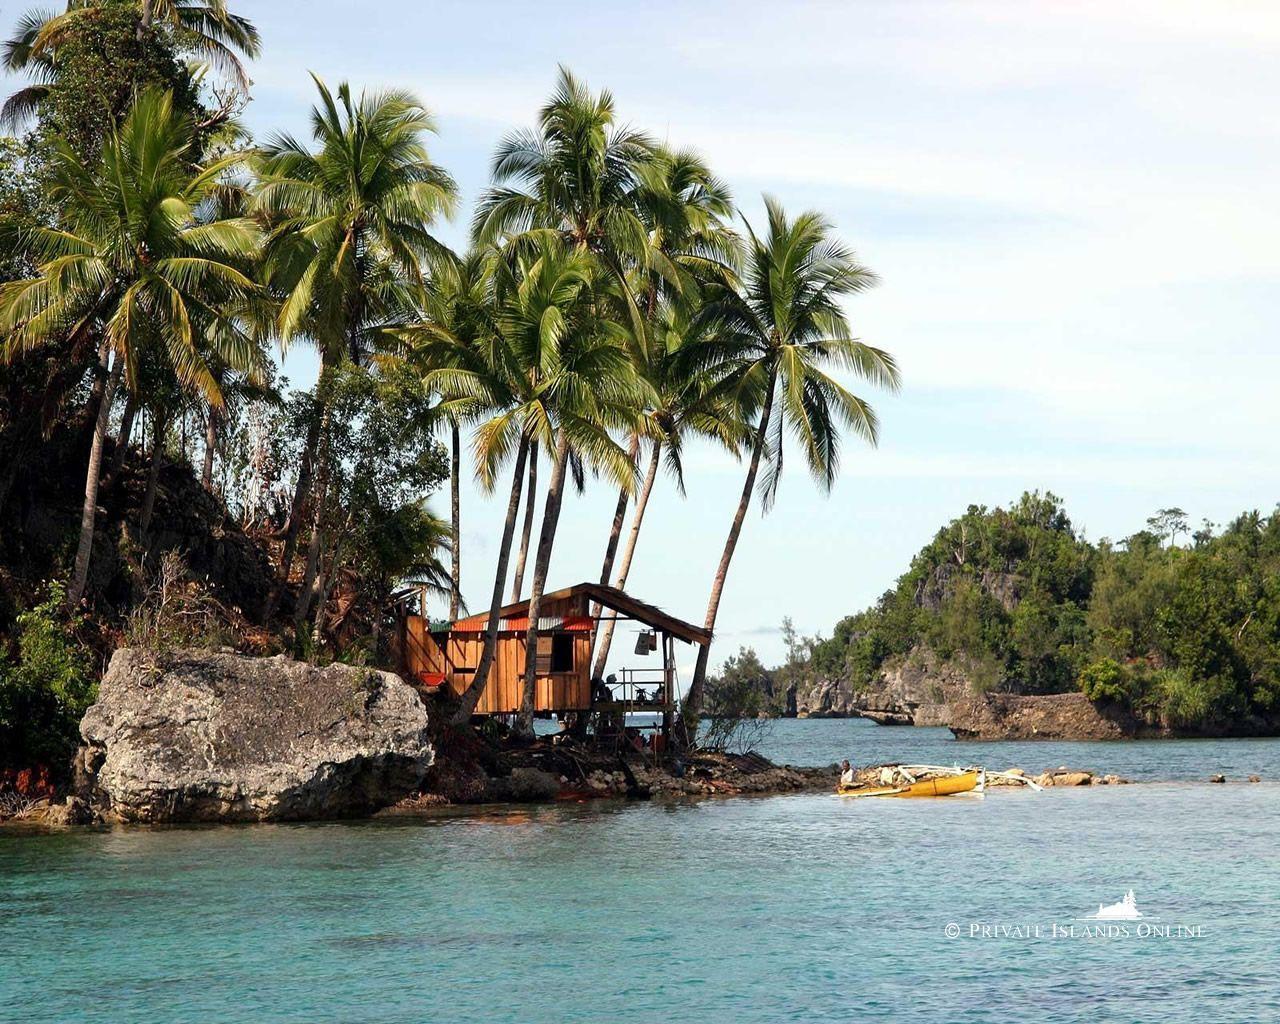 caribbean island postcard wallpaper - photo #42